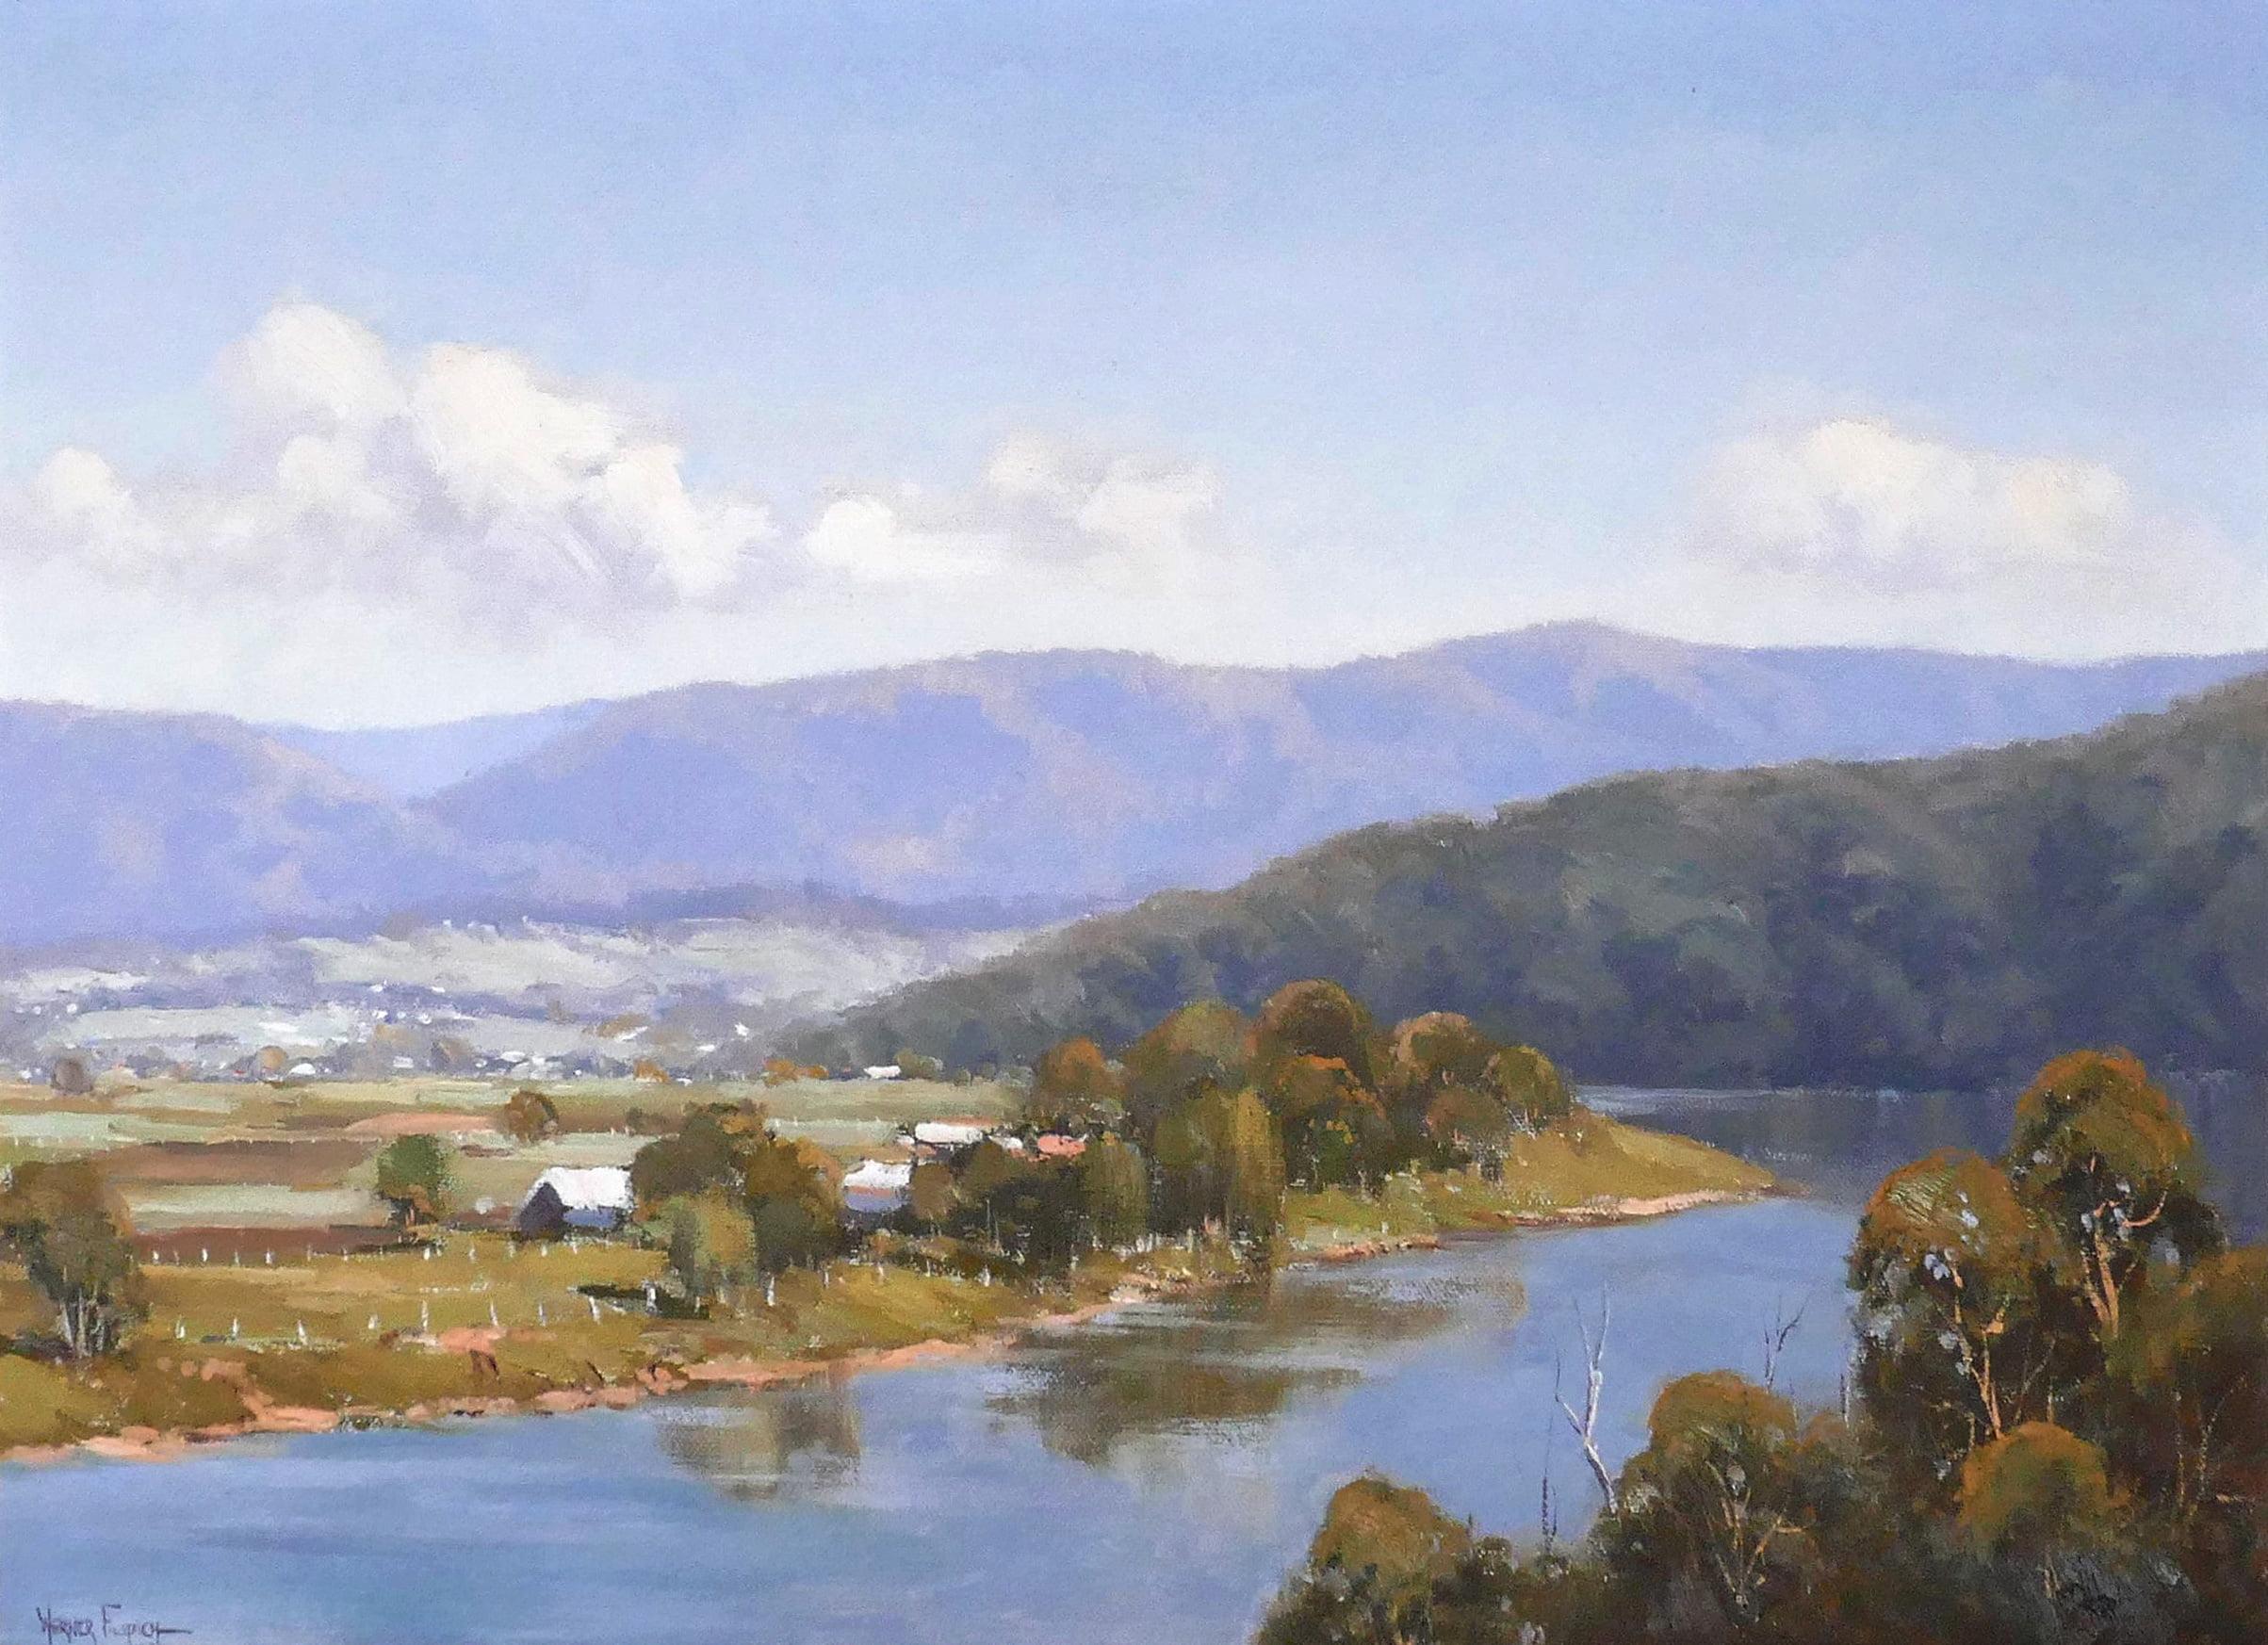 05. Hawkesbury River